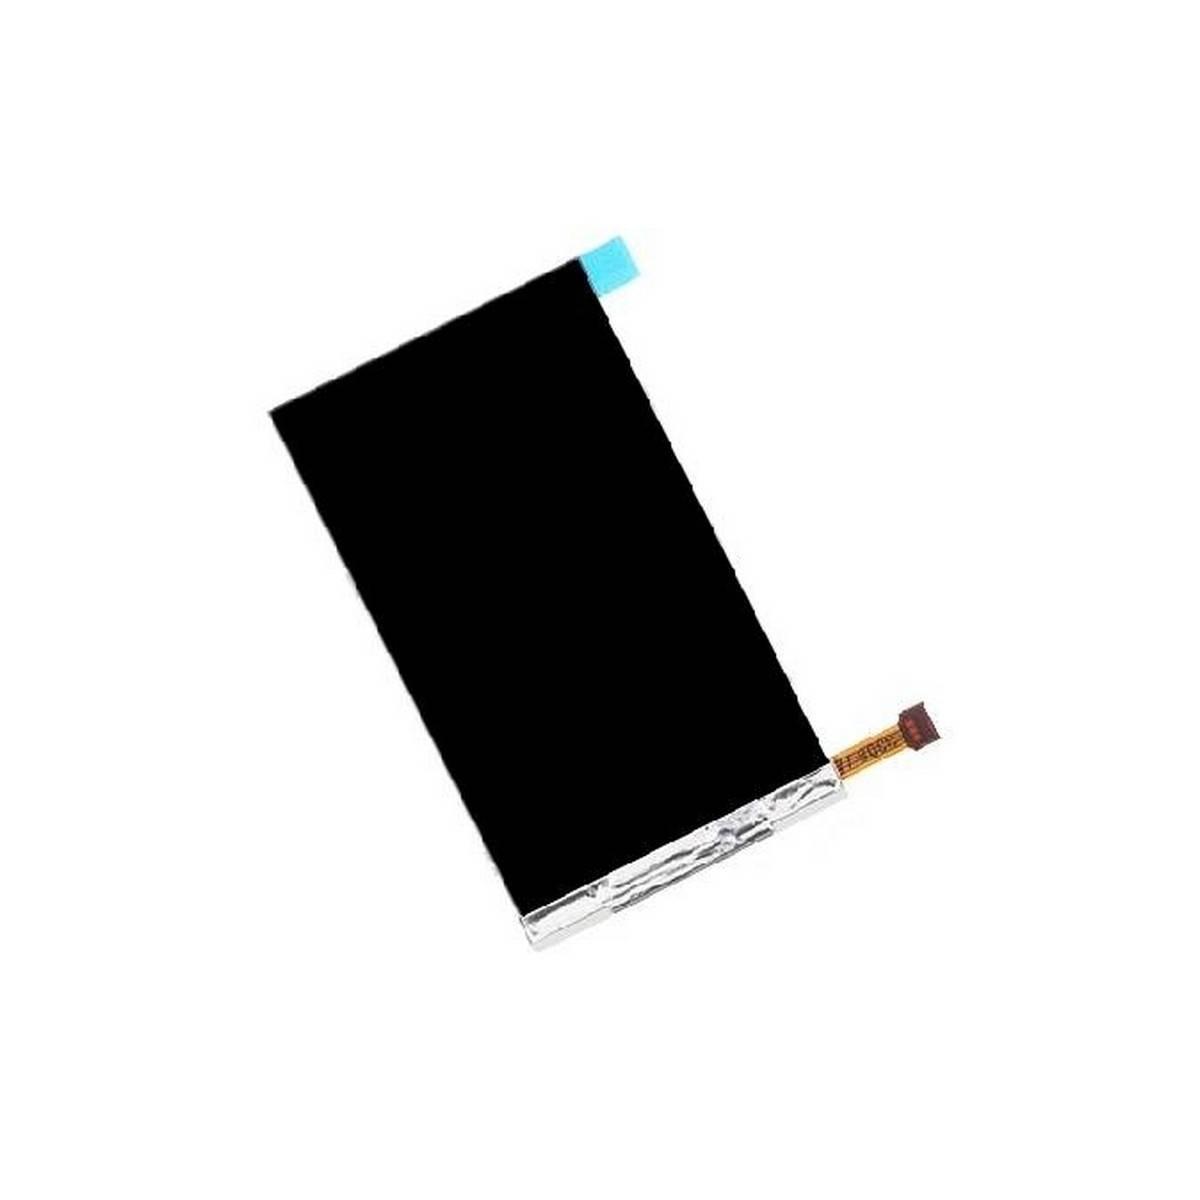 PANTALLA LCD NOKIA LUMIA 520